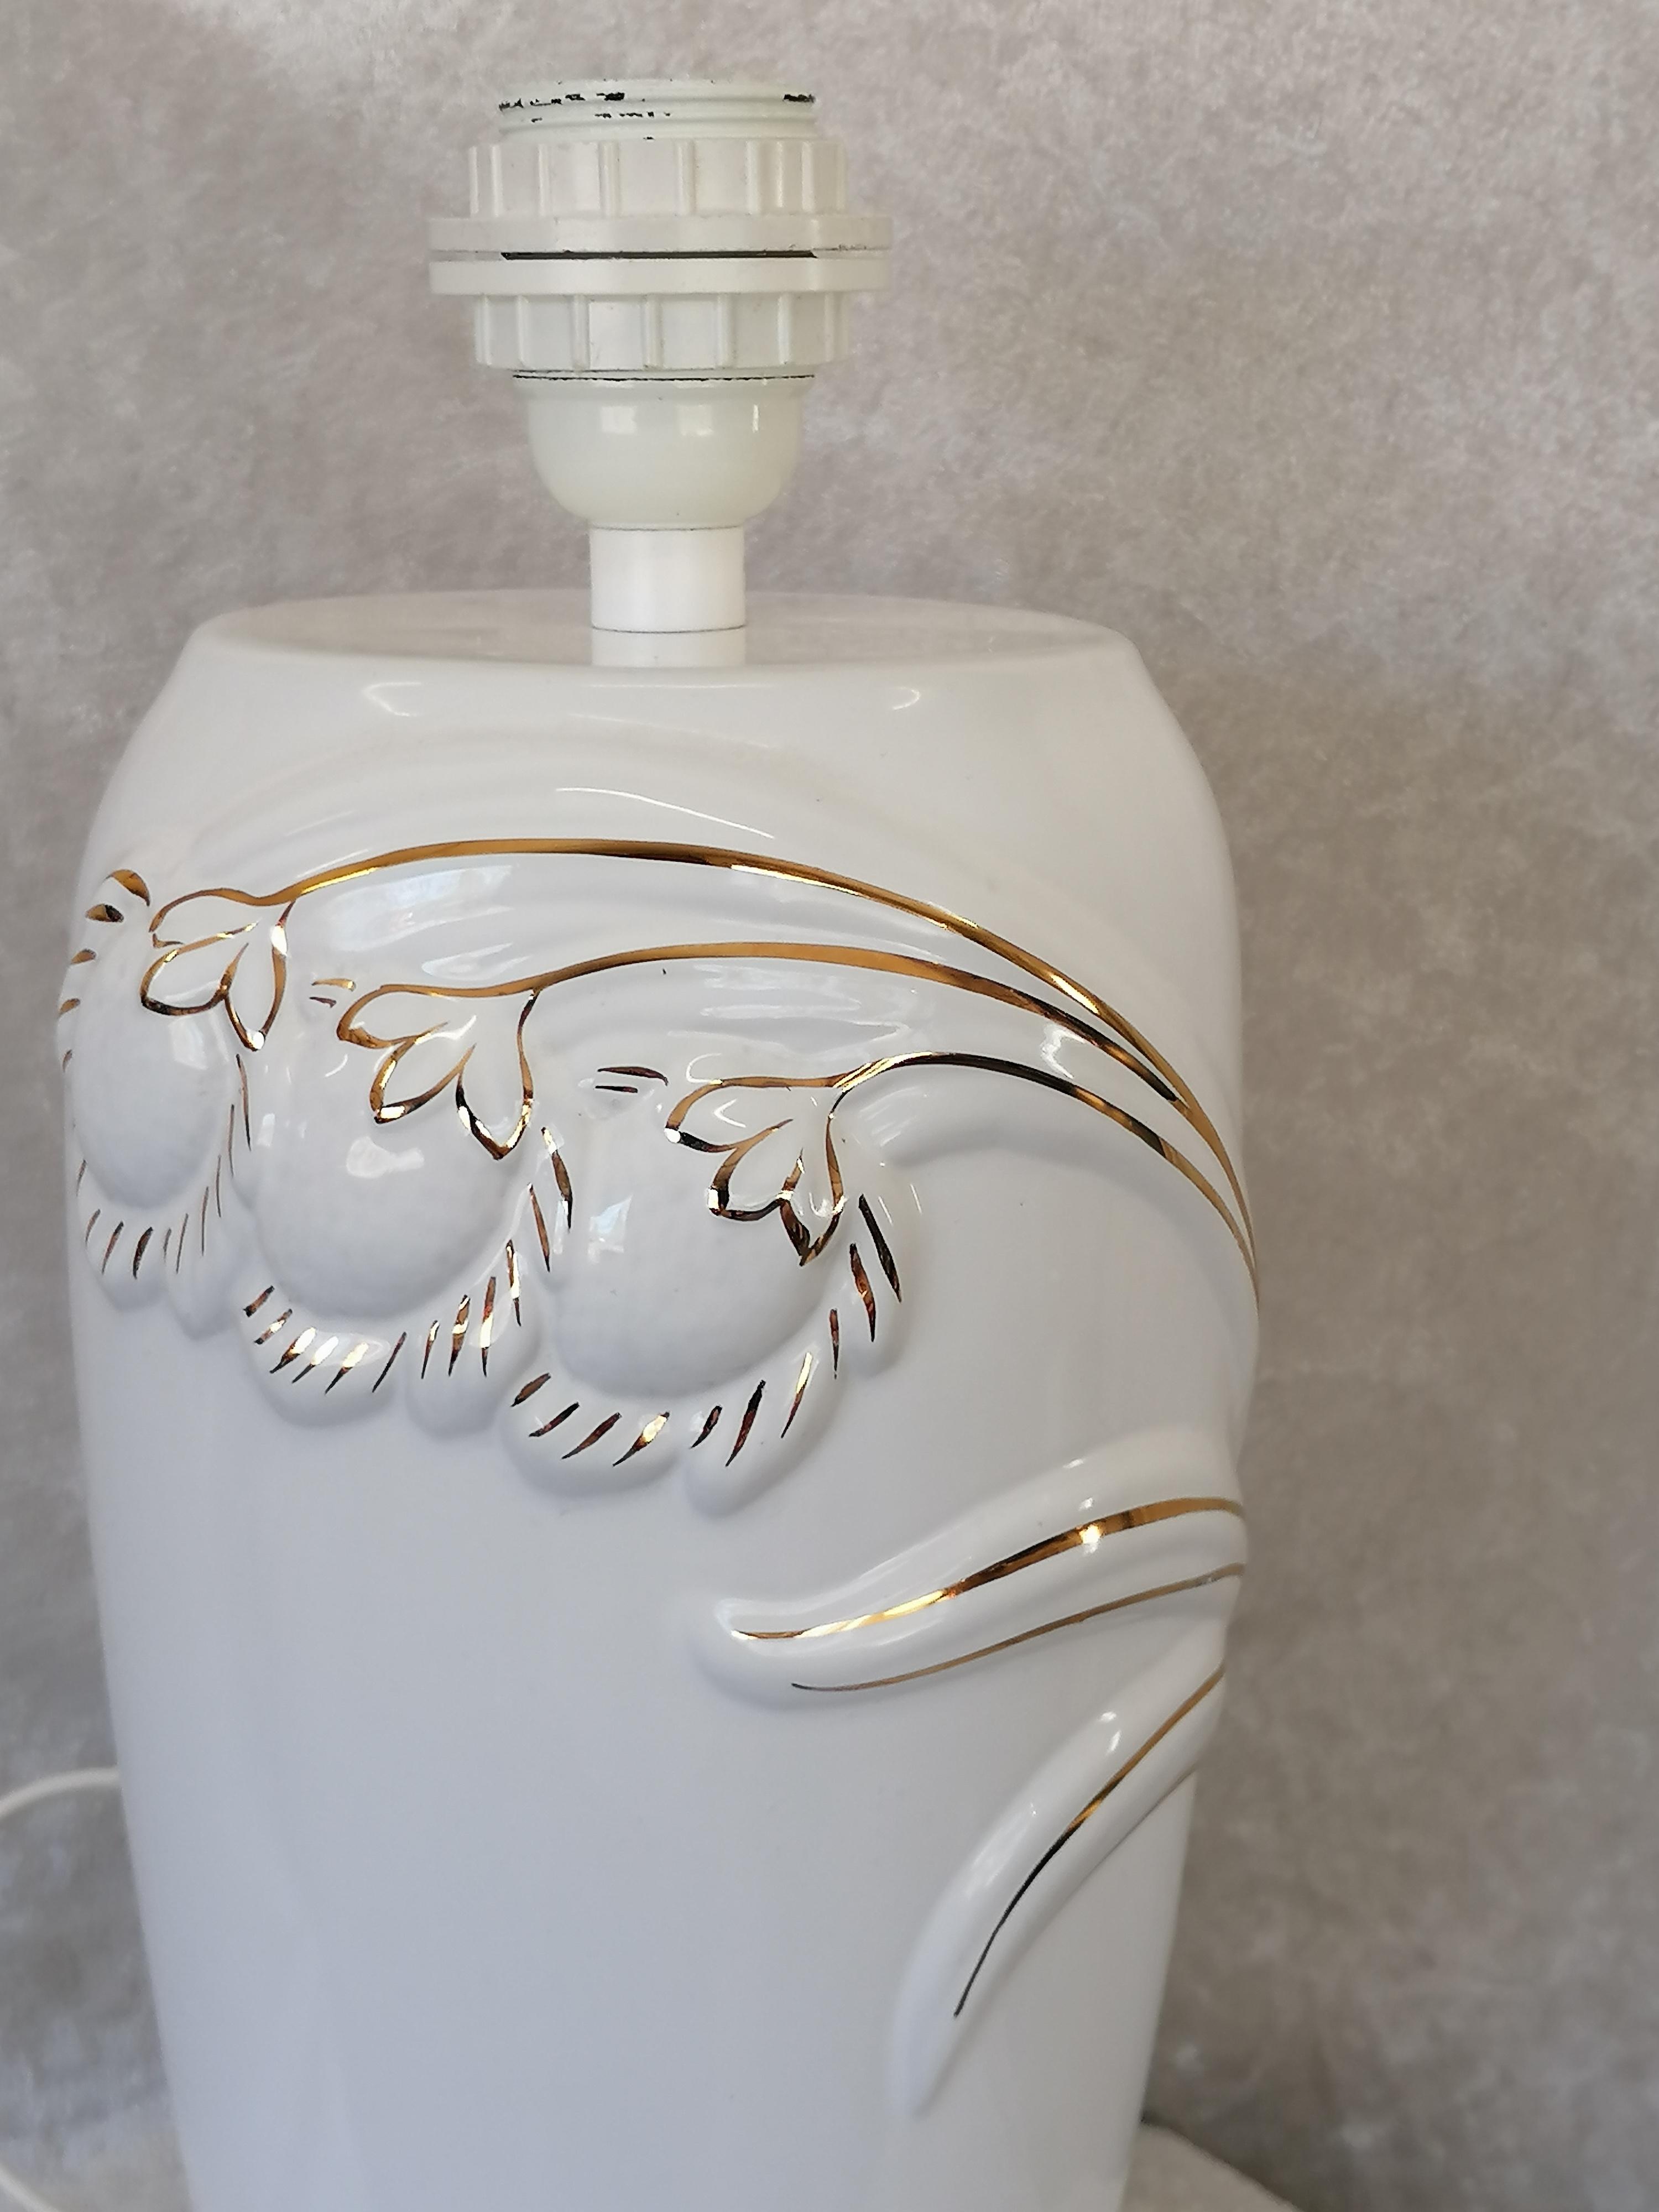 Porslinslampfot med guldlinjer